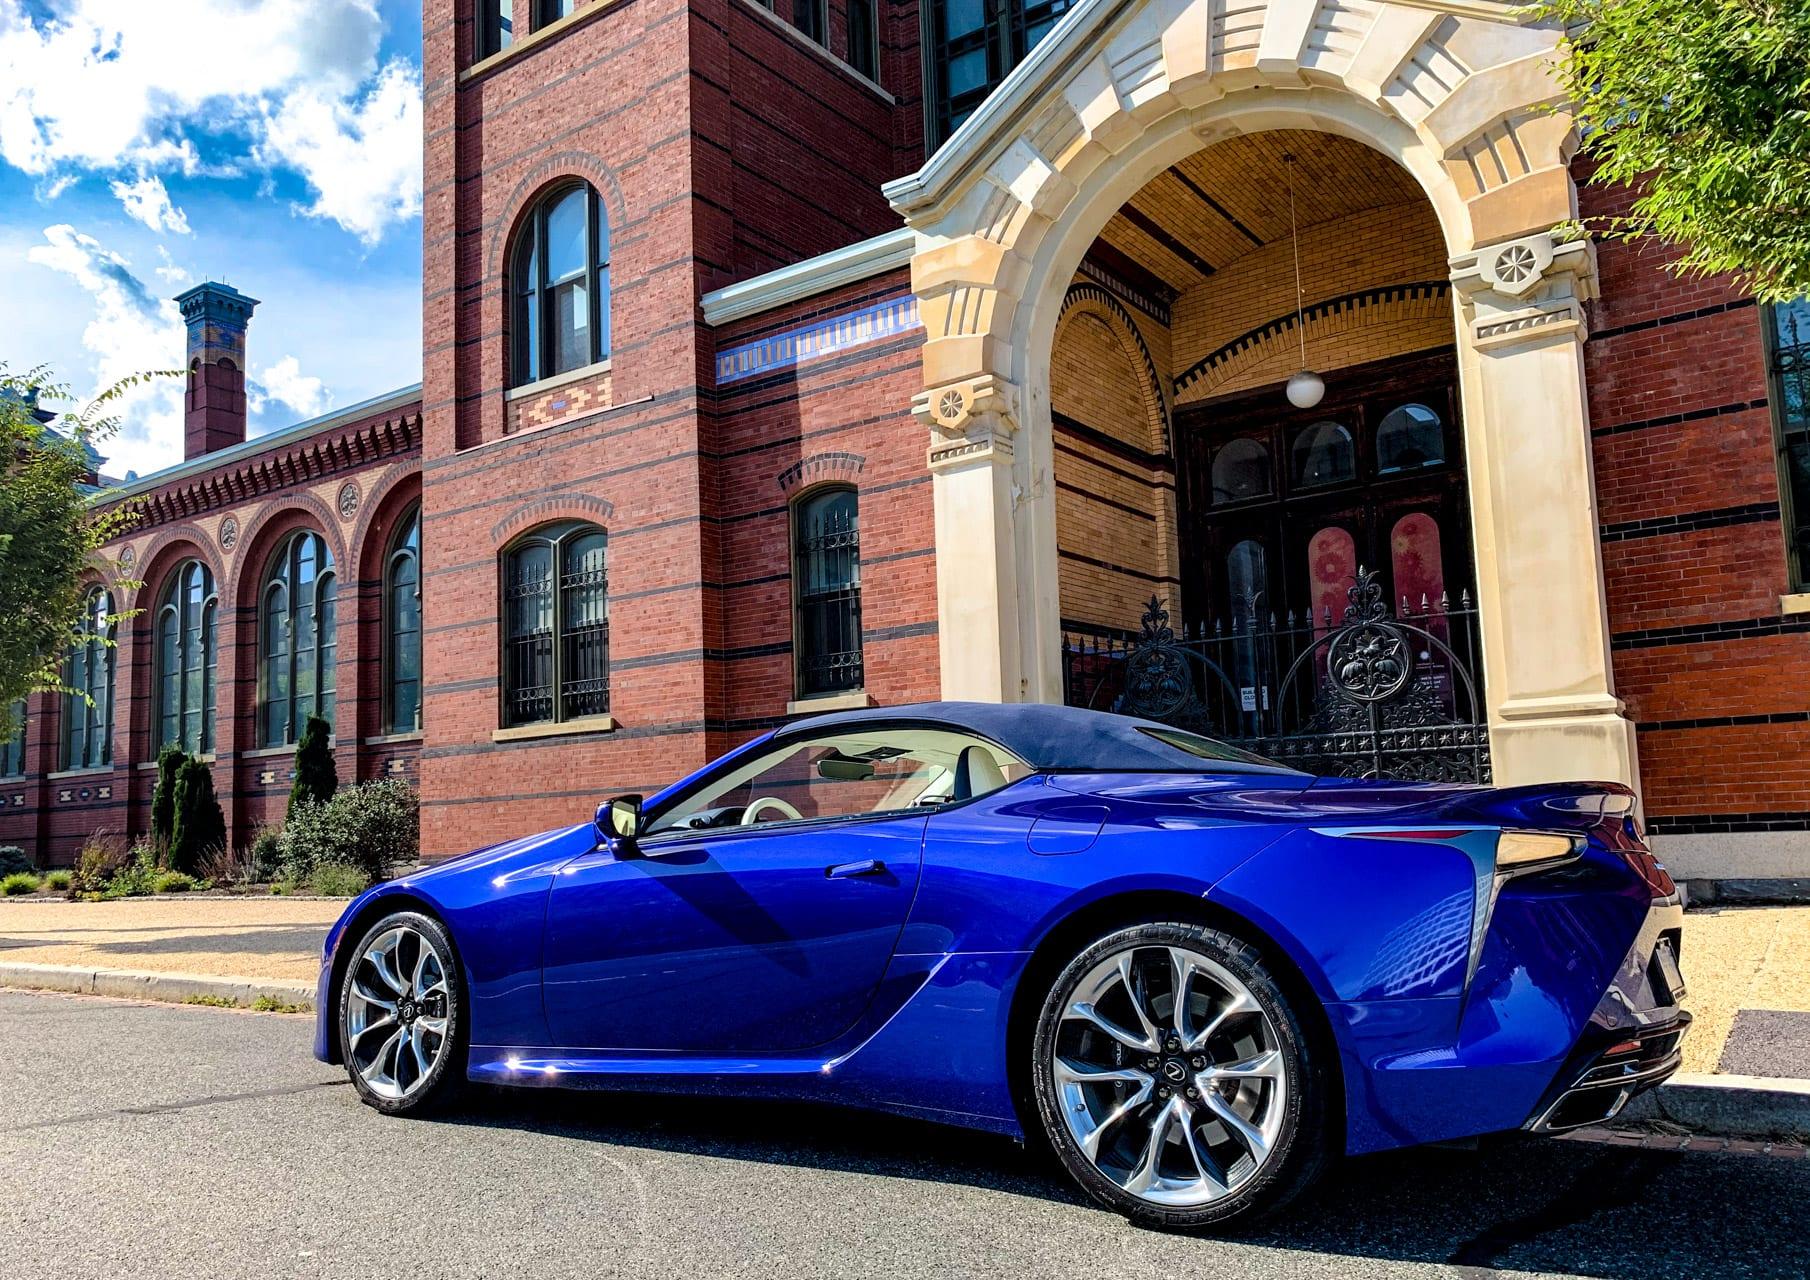 2021 Lexus LC 500 Convertible Inspiration Series